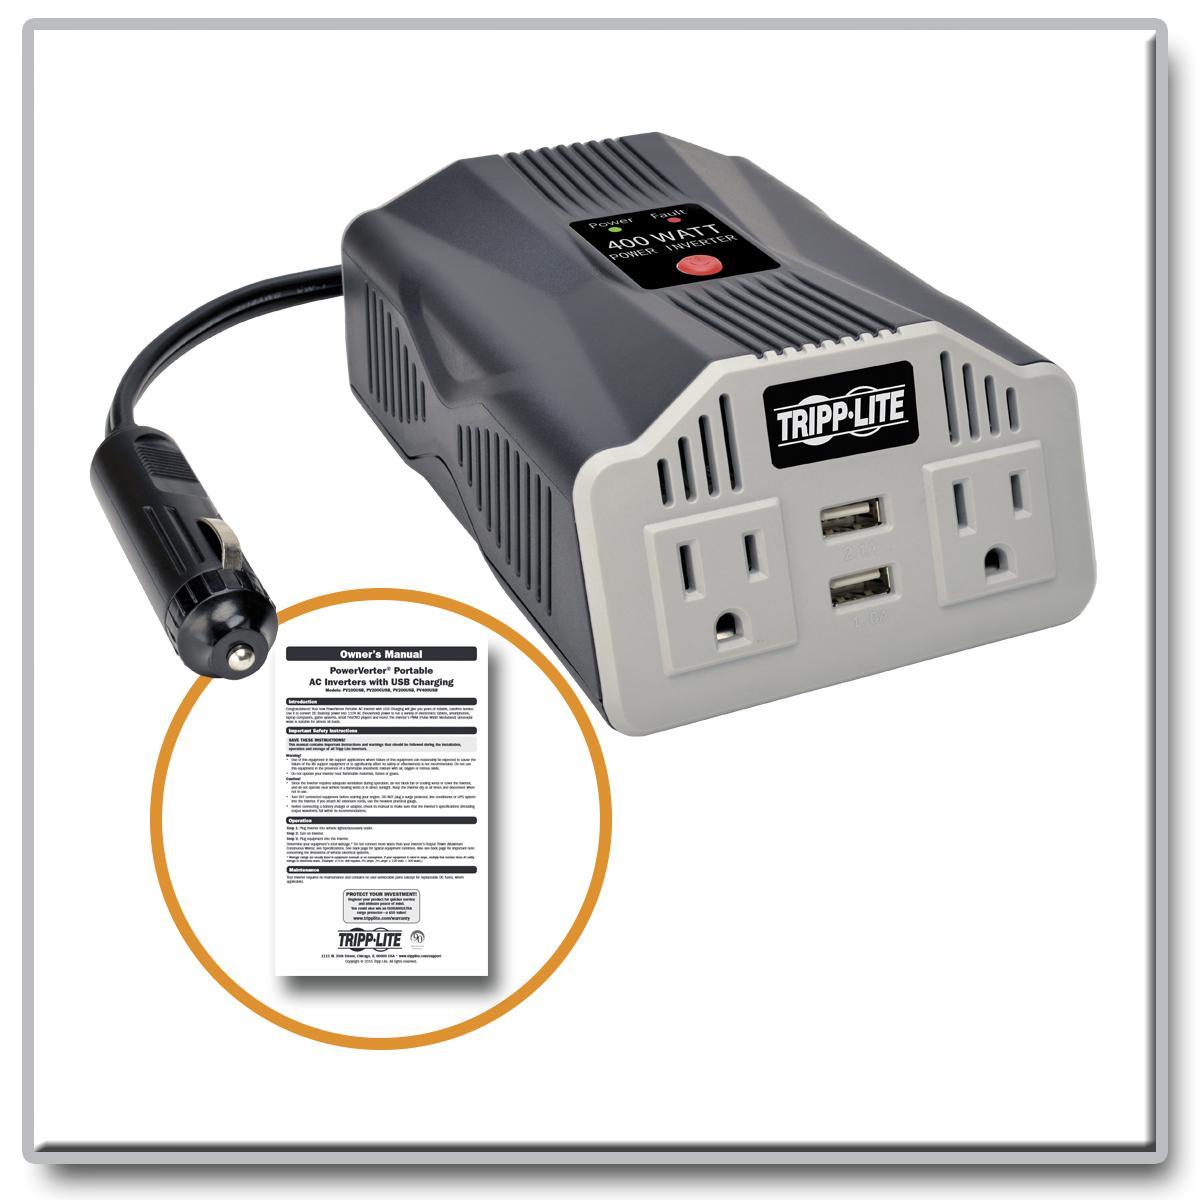 Amazon.com: Tripp Lite 400W Car Power Inverter with 2